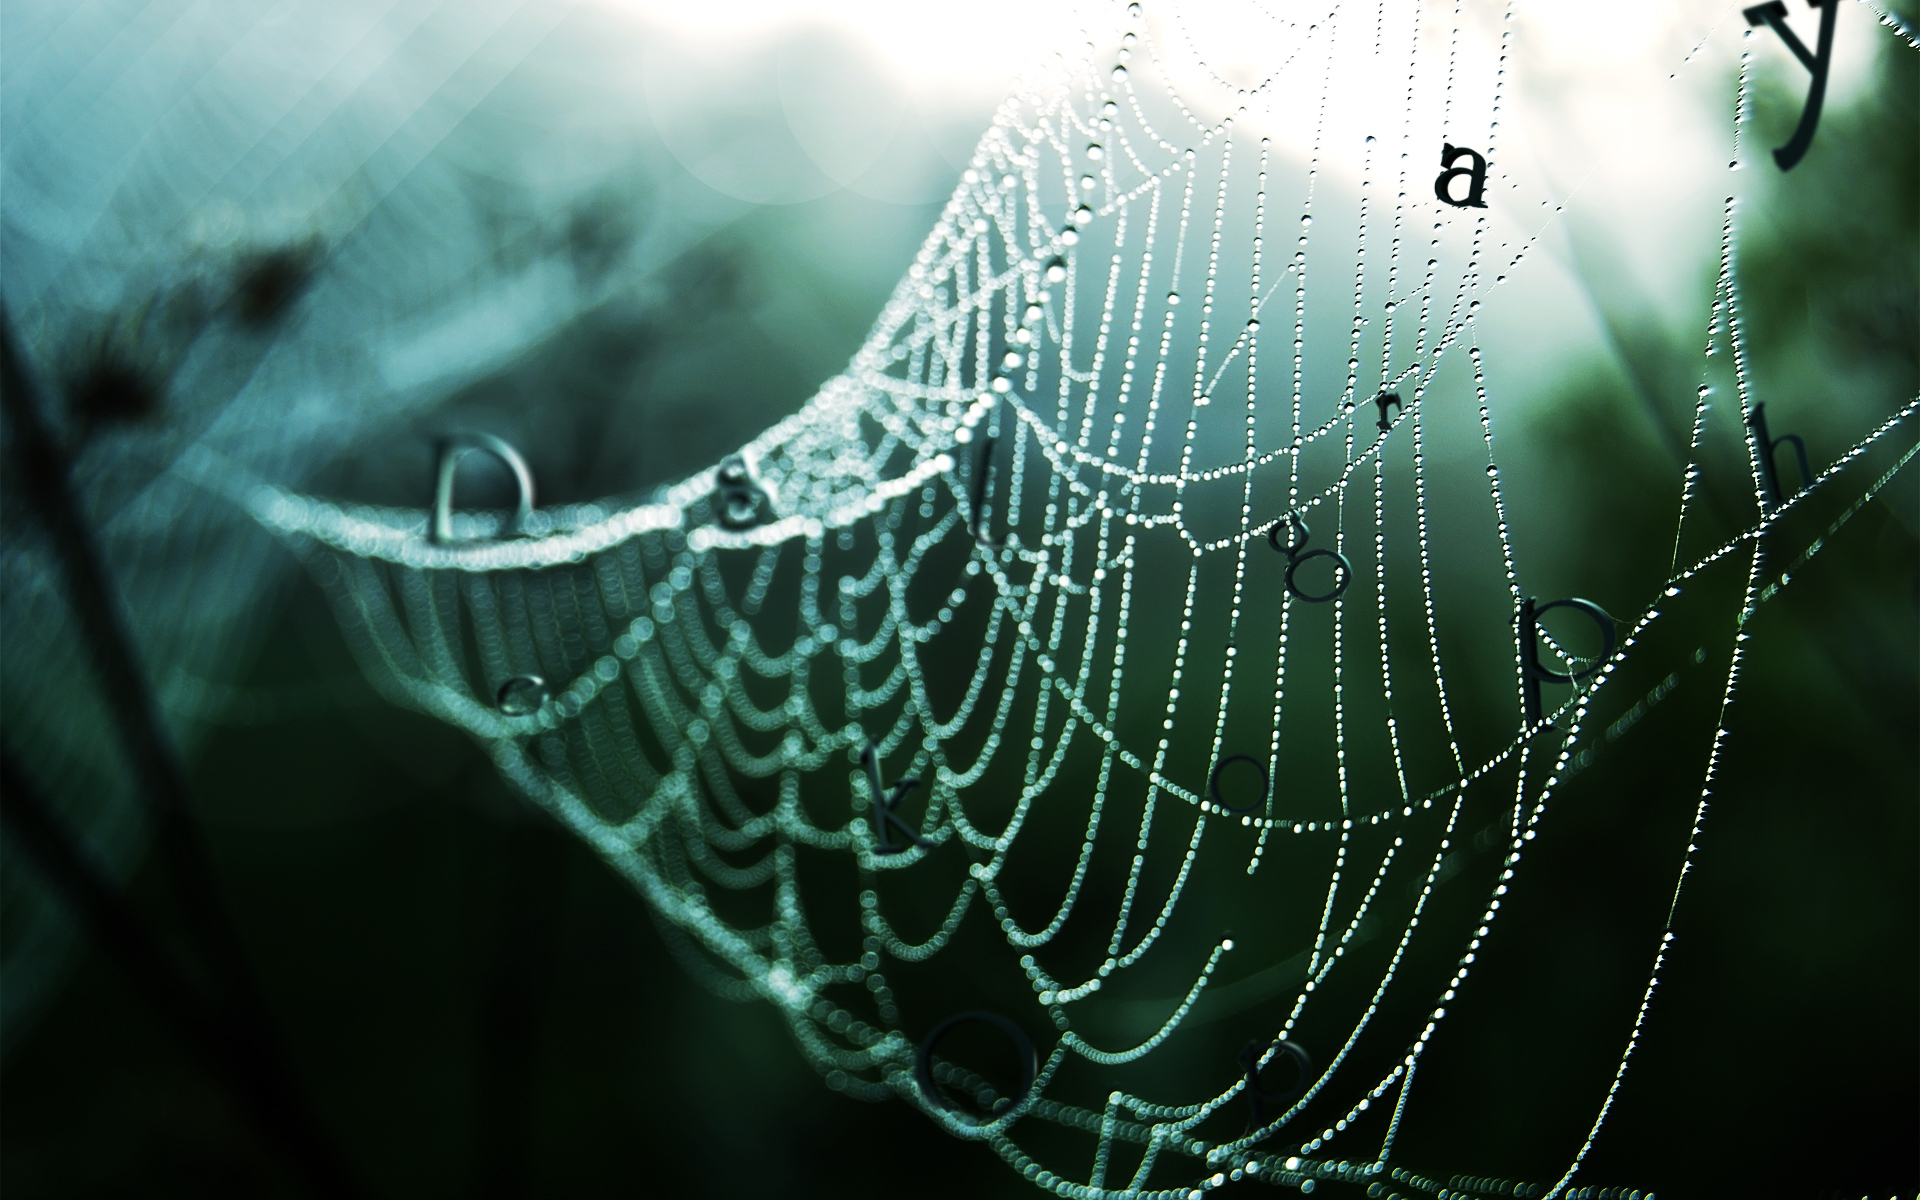 1920x1200 Wet spider web desktop PC and Mac wallpaper 1920x1200